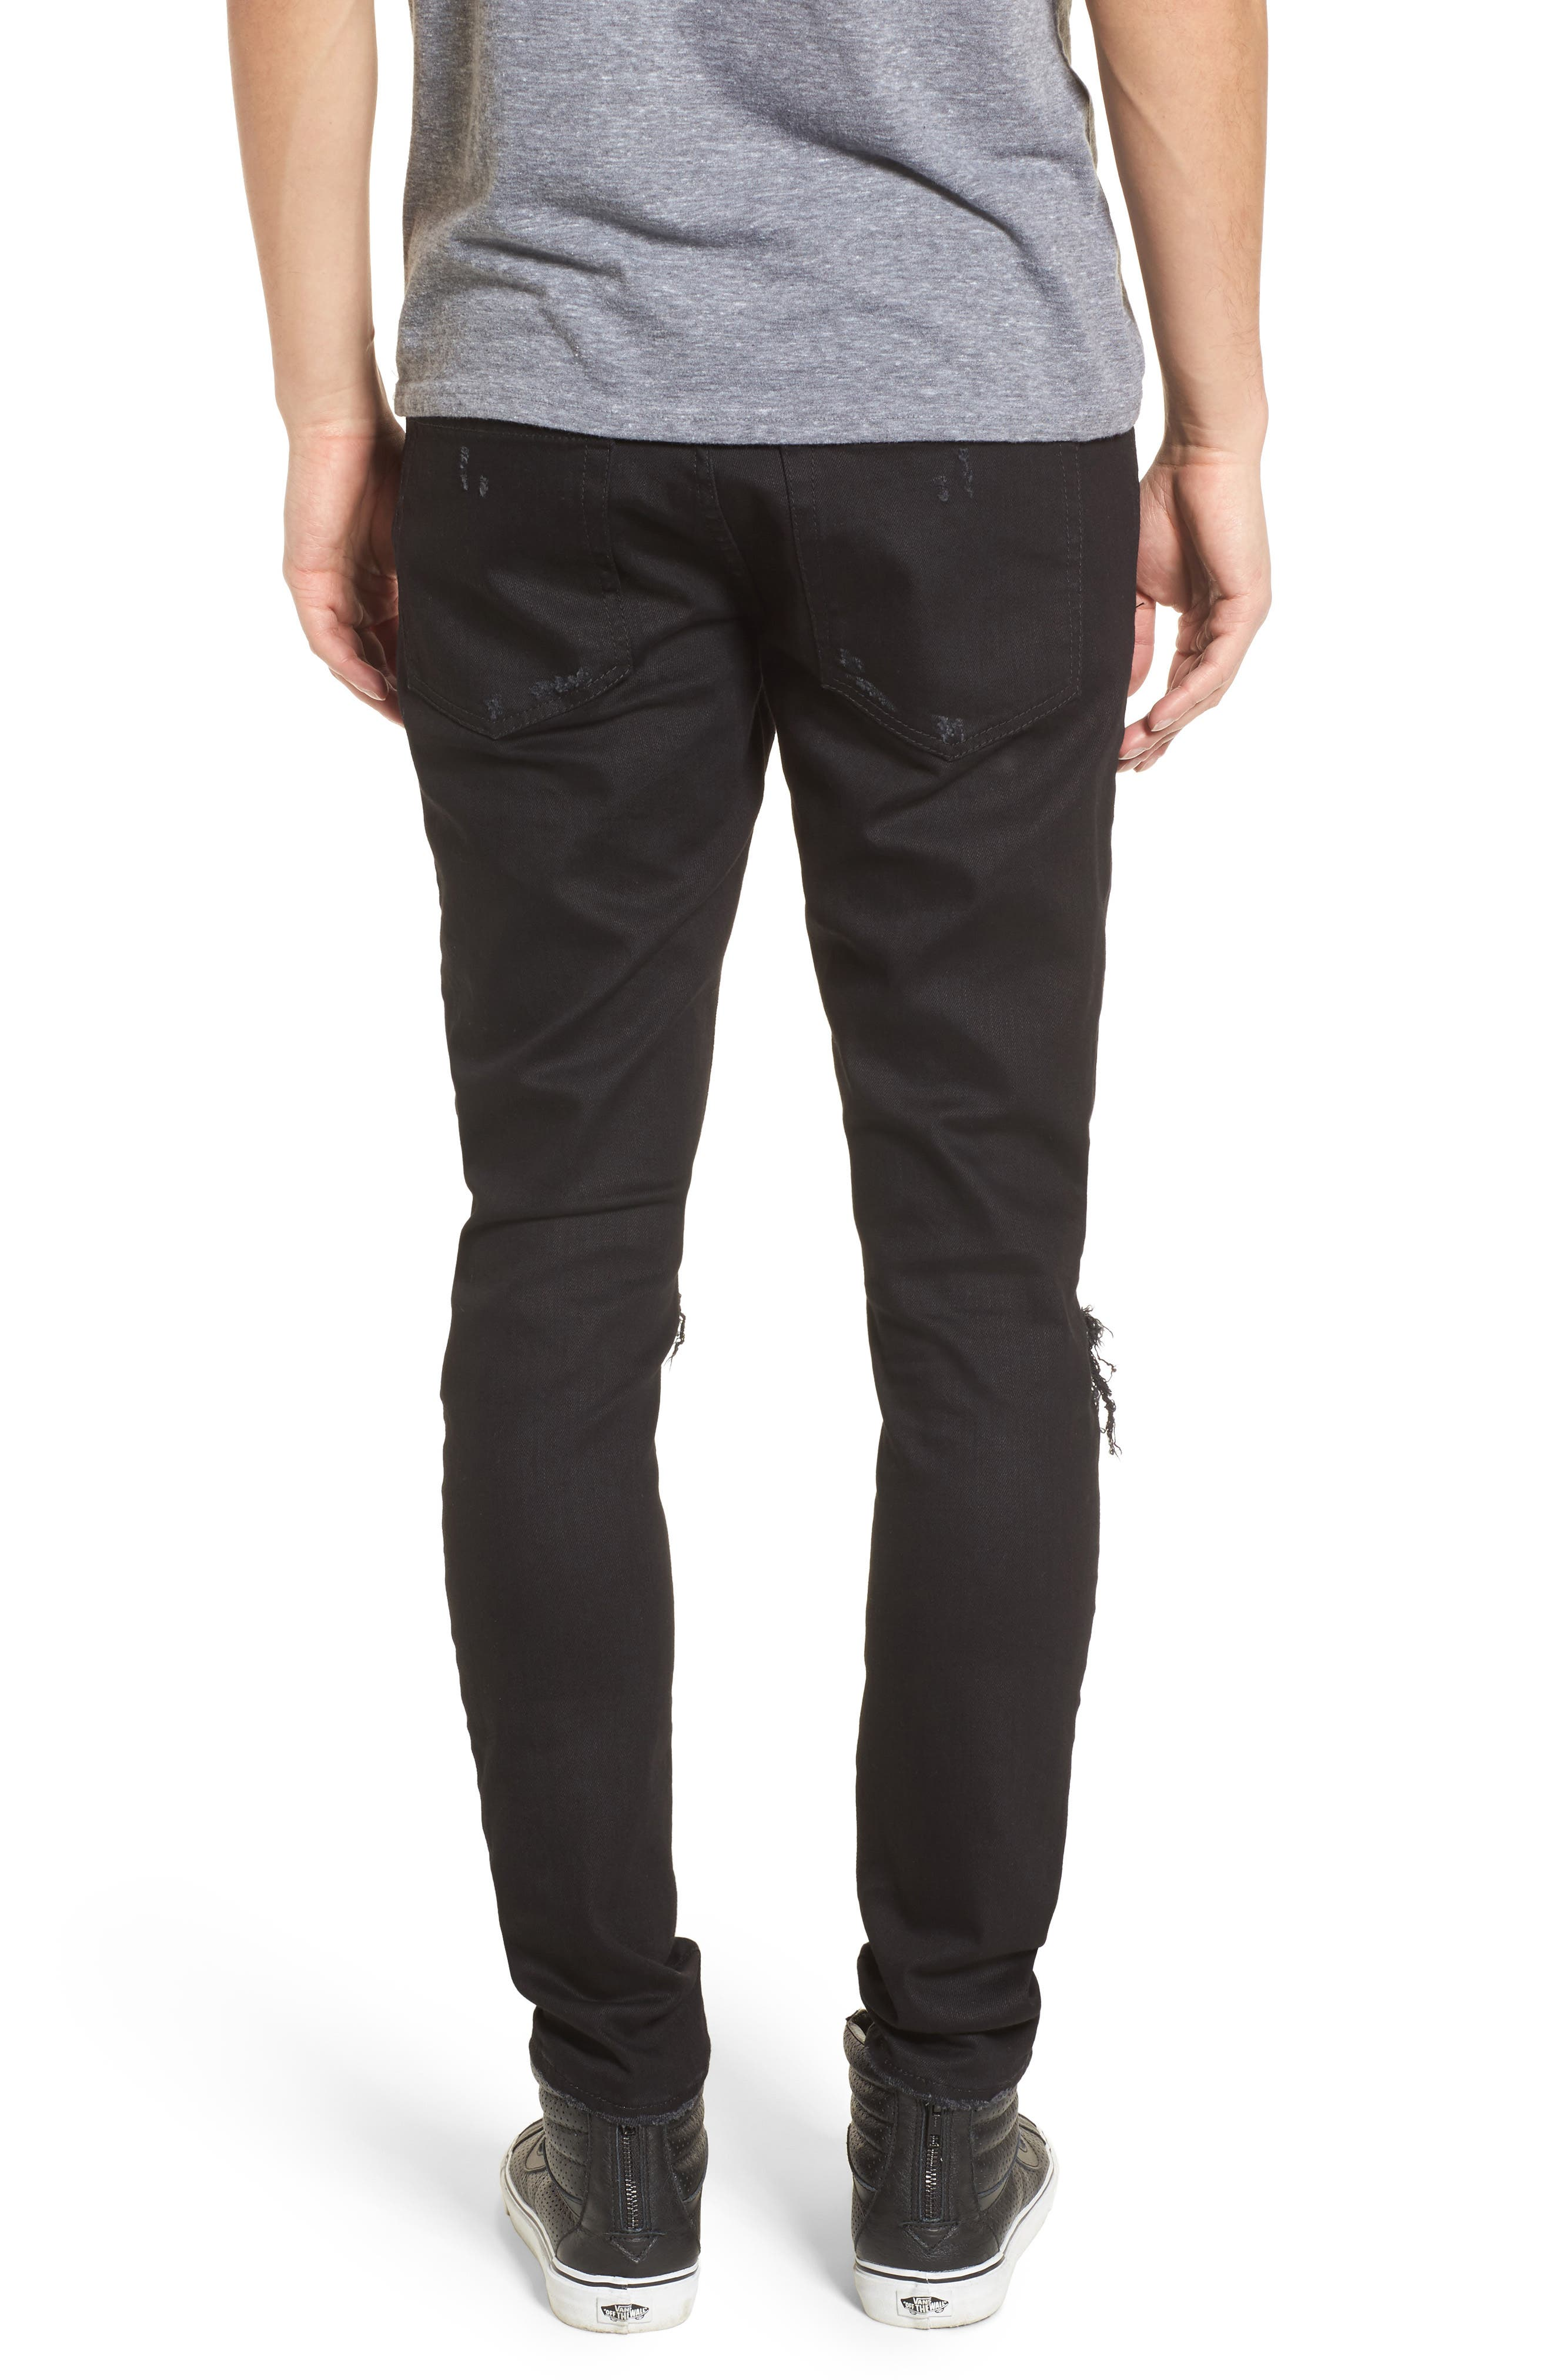 Destroyer Slim Fit Jeans,                             Alternate thumbnail 2, color,                             001